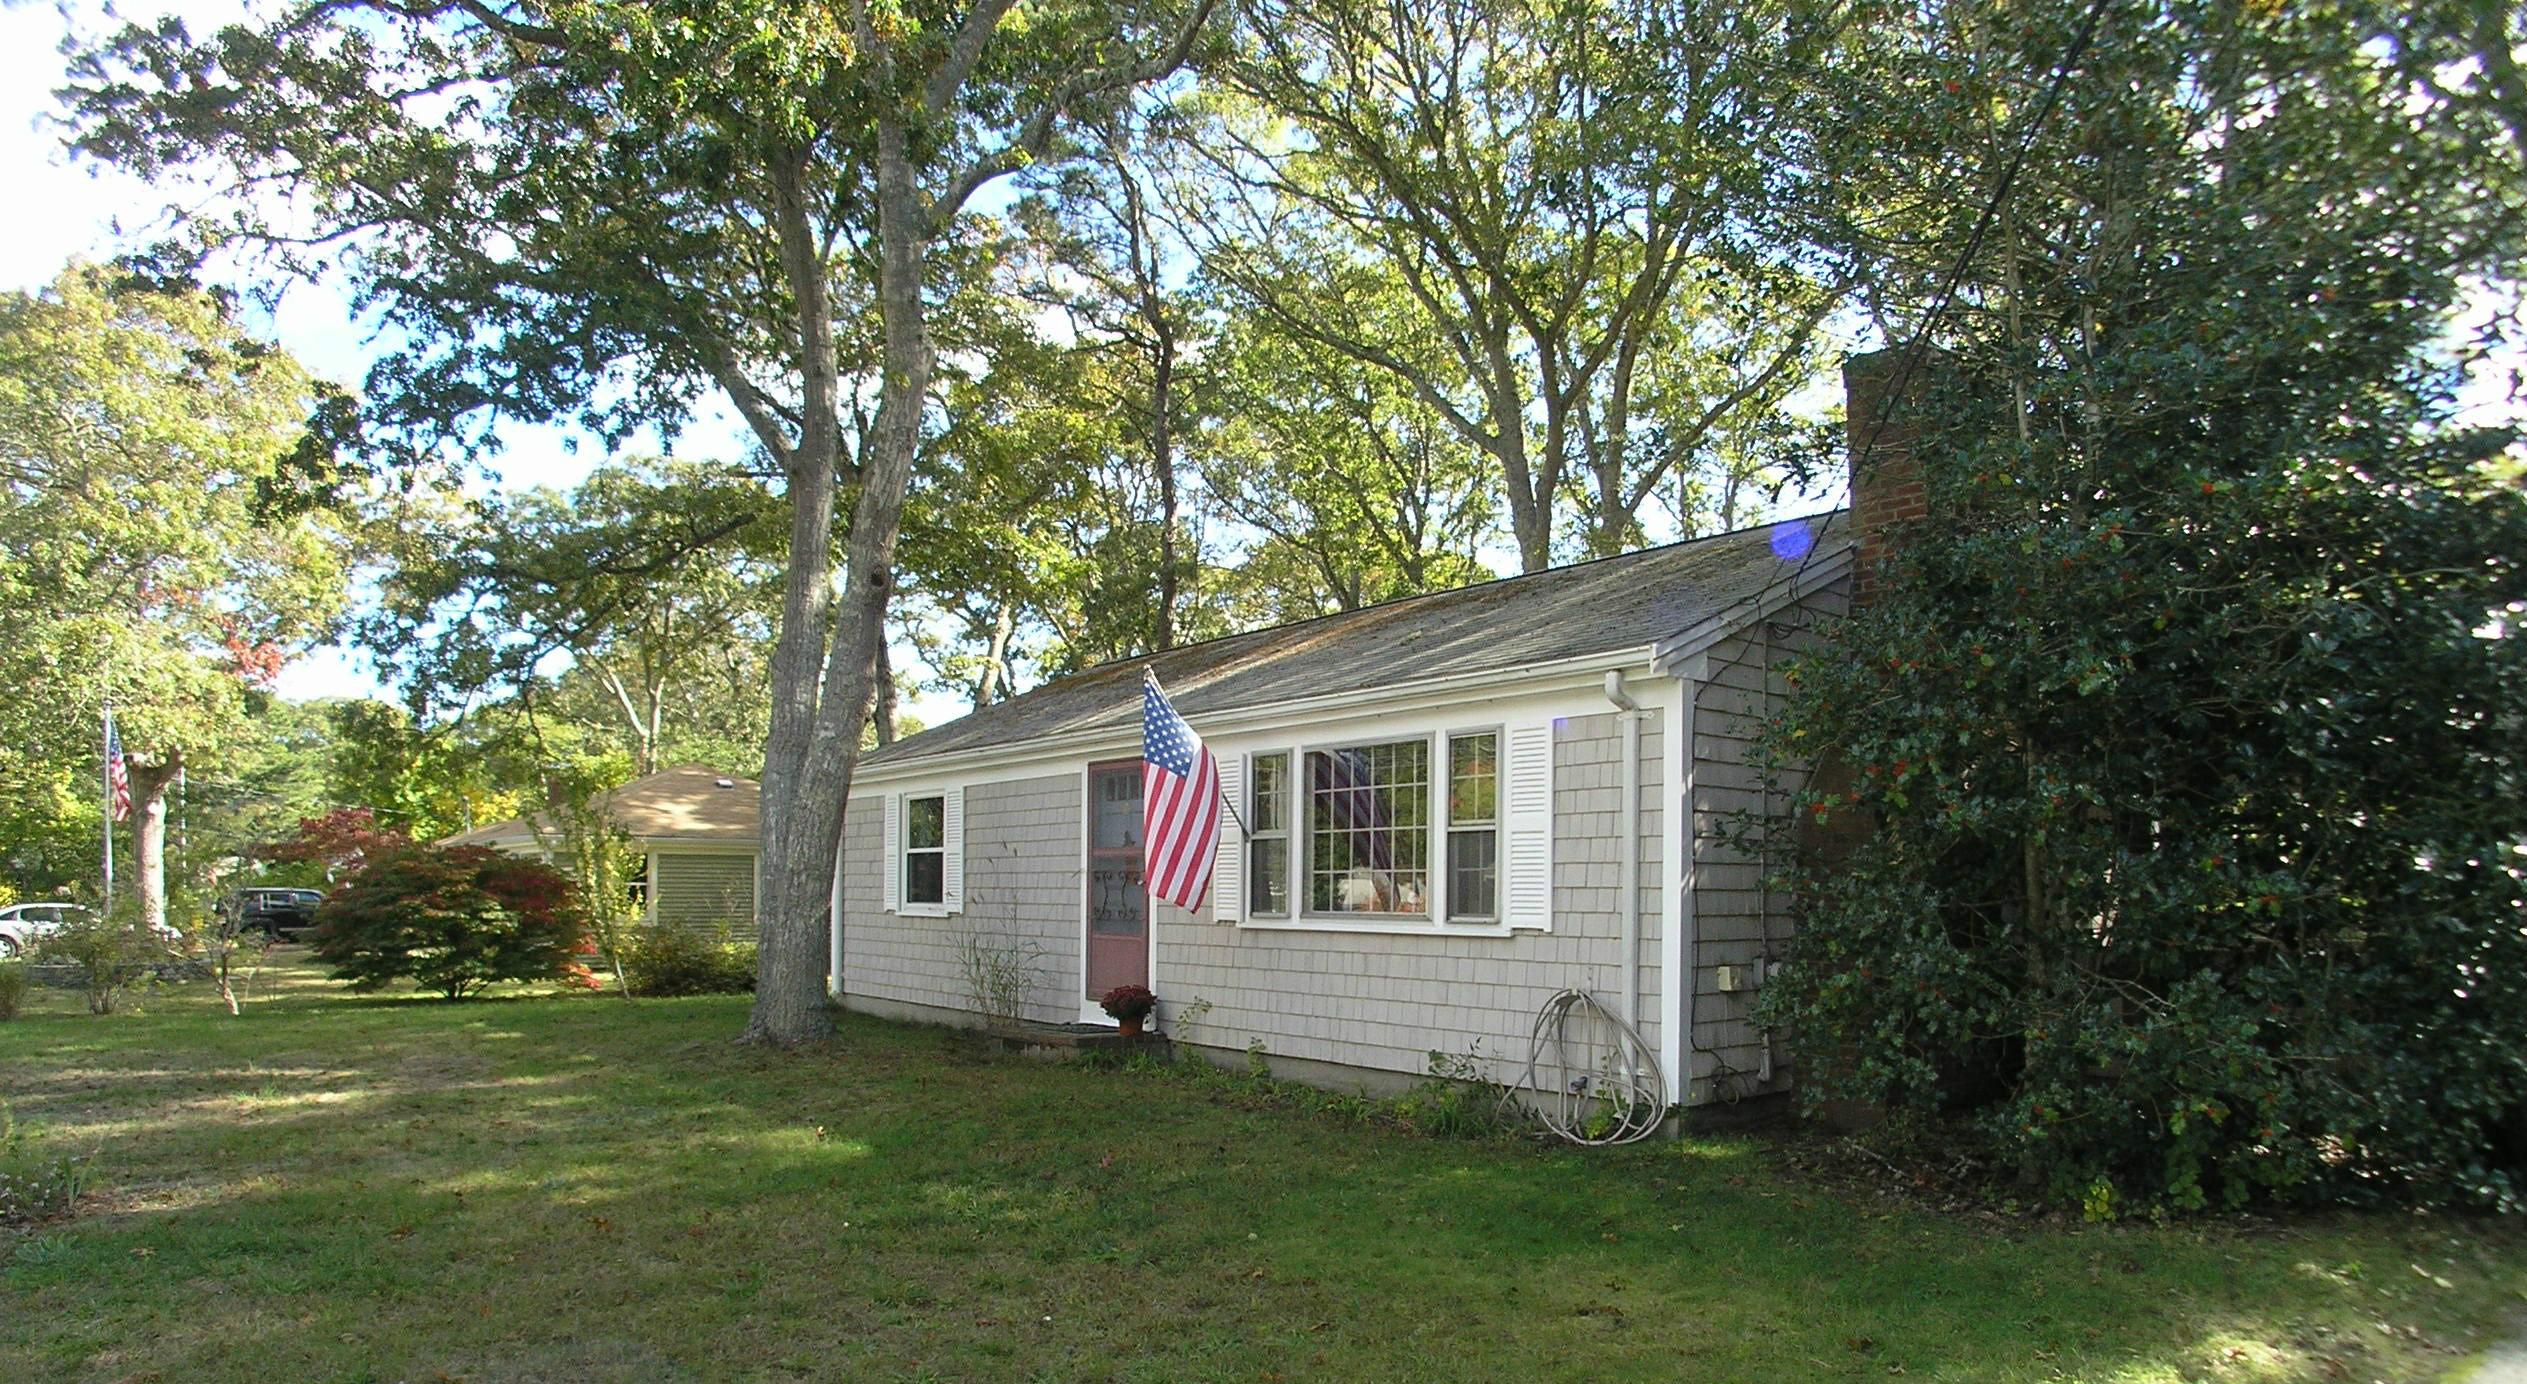 17 Lakewood Road, South Yarmouth, Massachusetts 02664